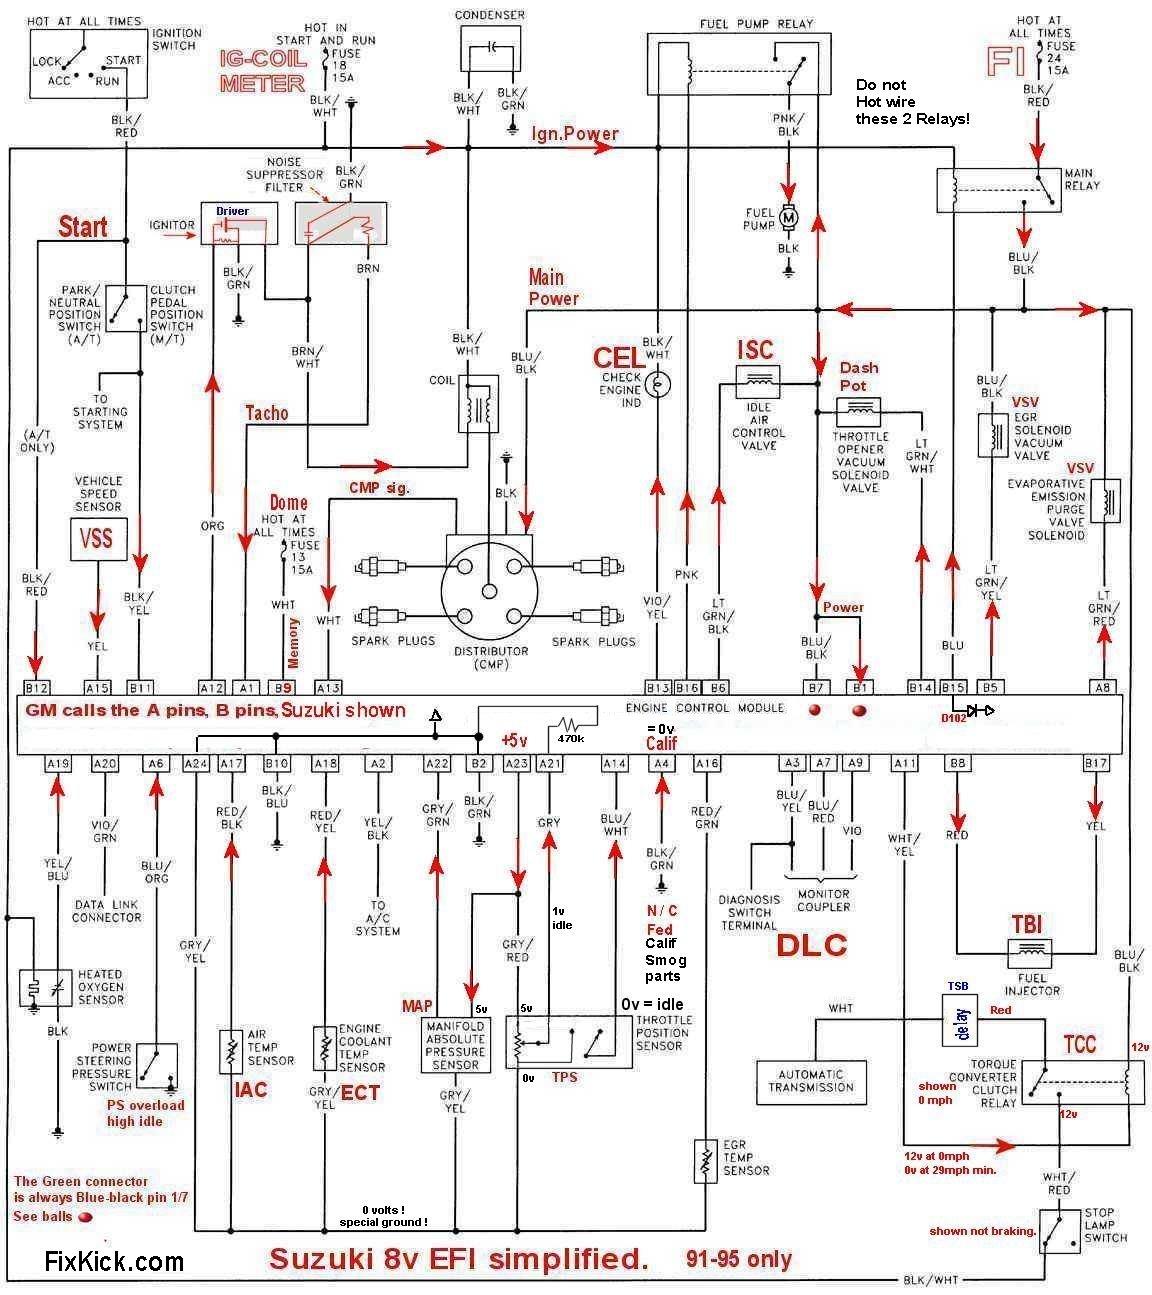 Suzuki Carry Wiring Diagram Wiring Diagram Models Brown Applied Brown Applied Zeevaproduction It